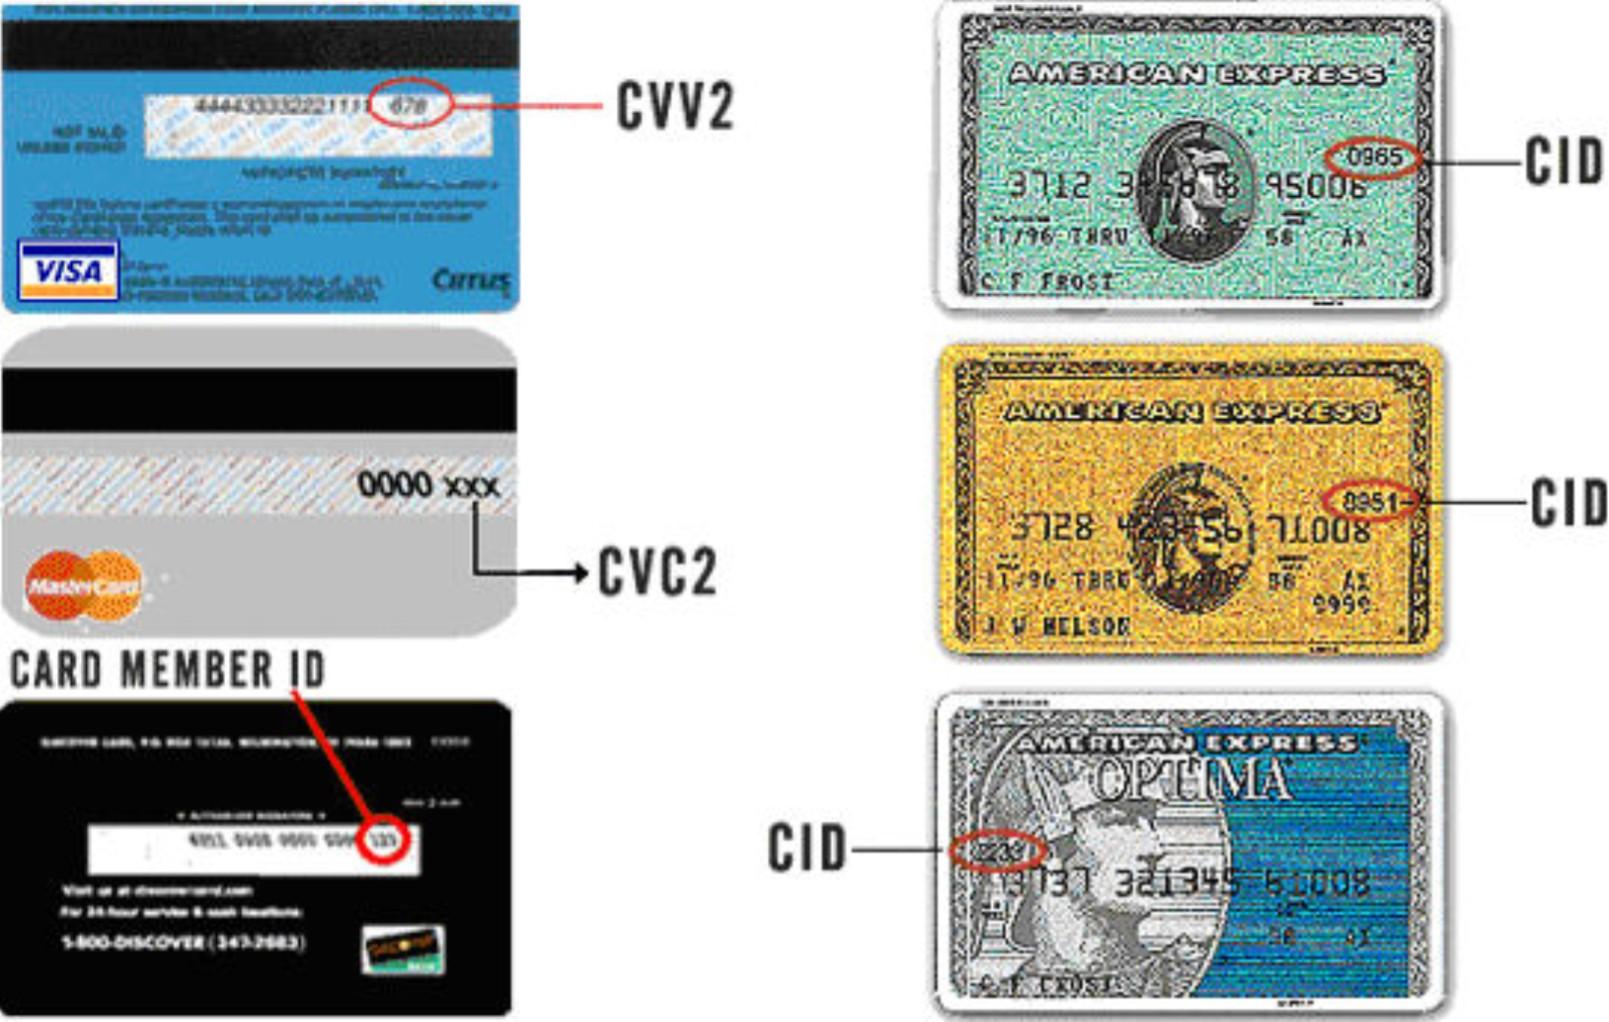 cvc code kreditkarte